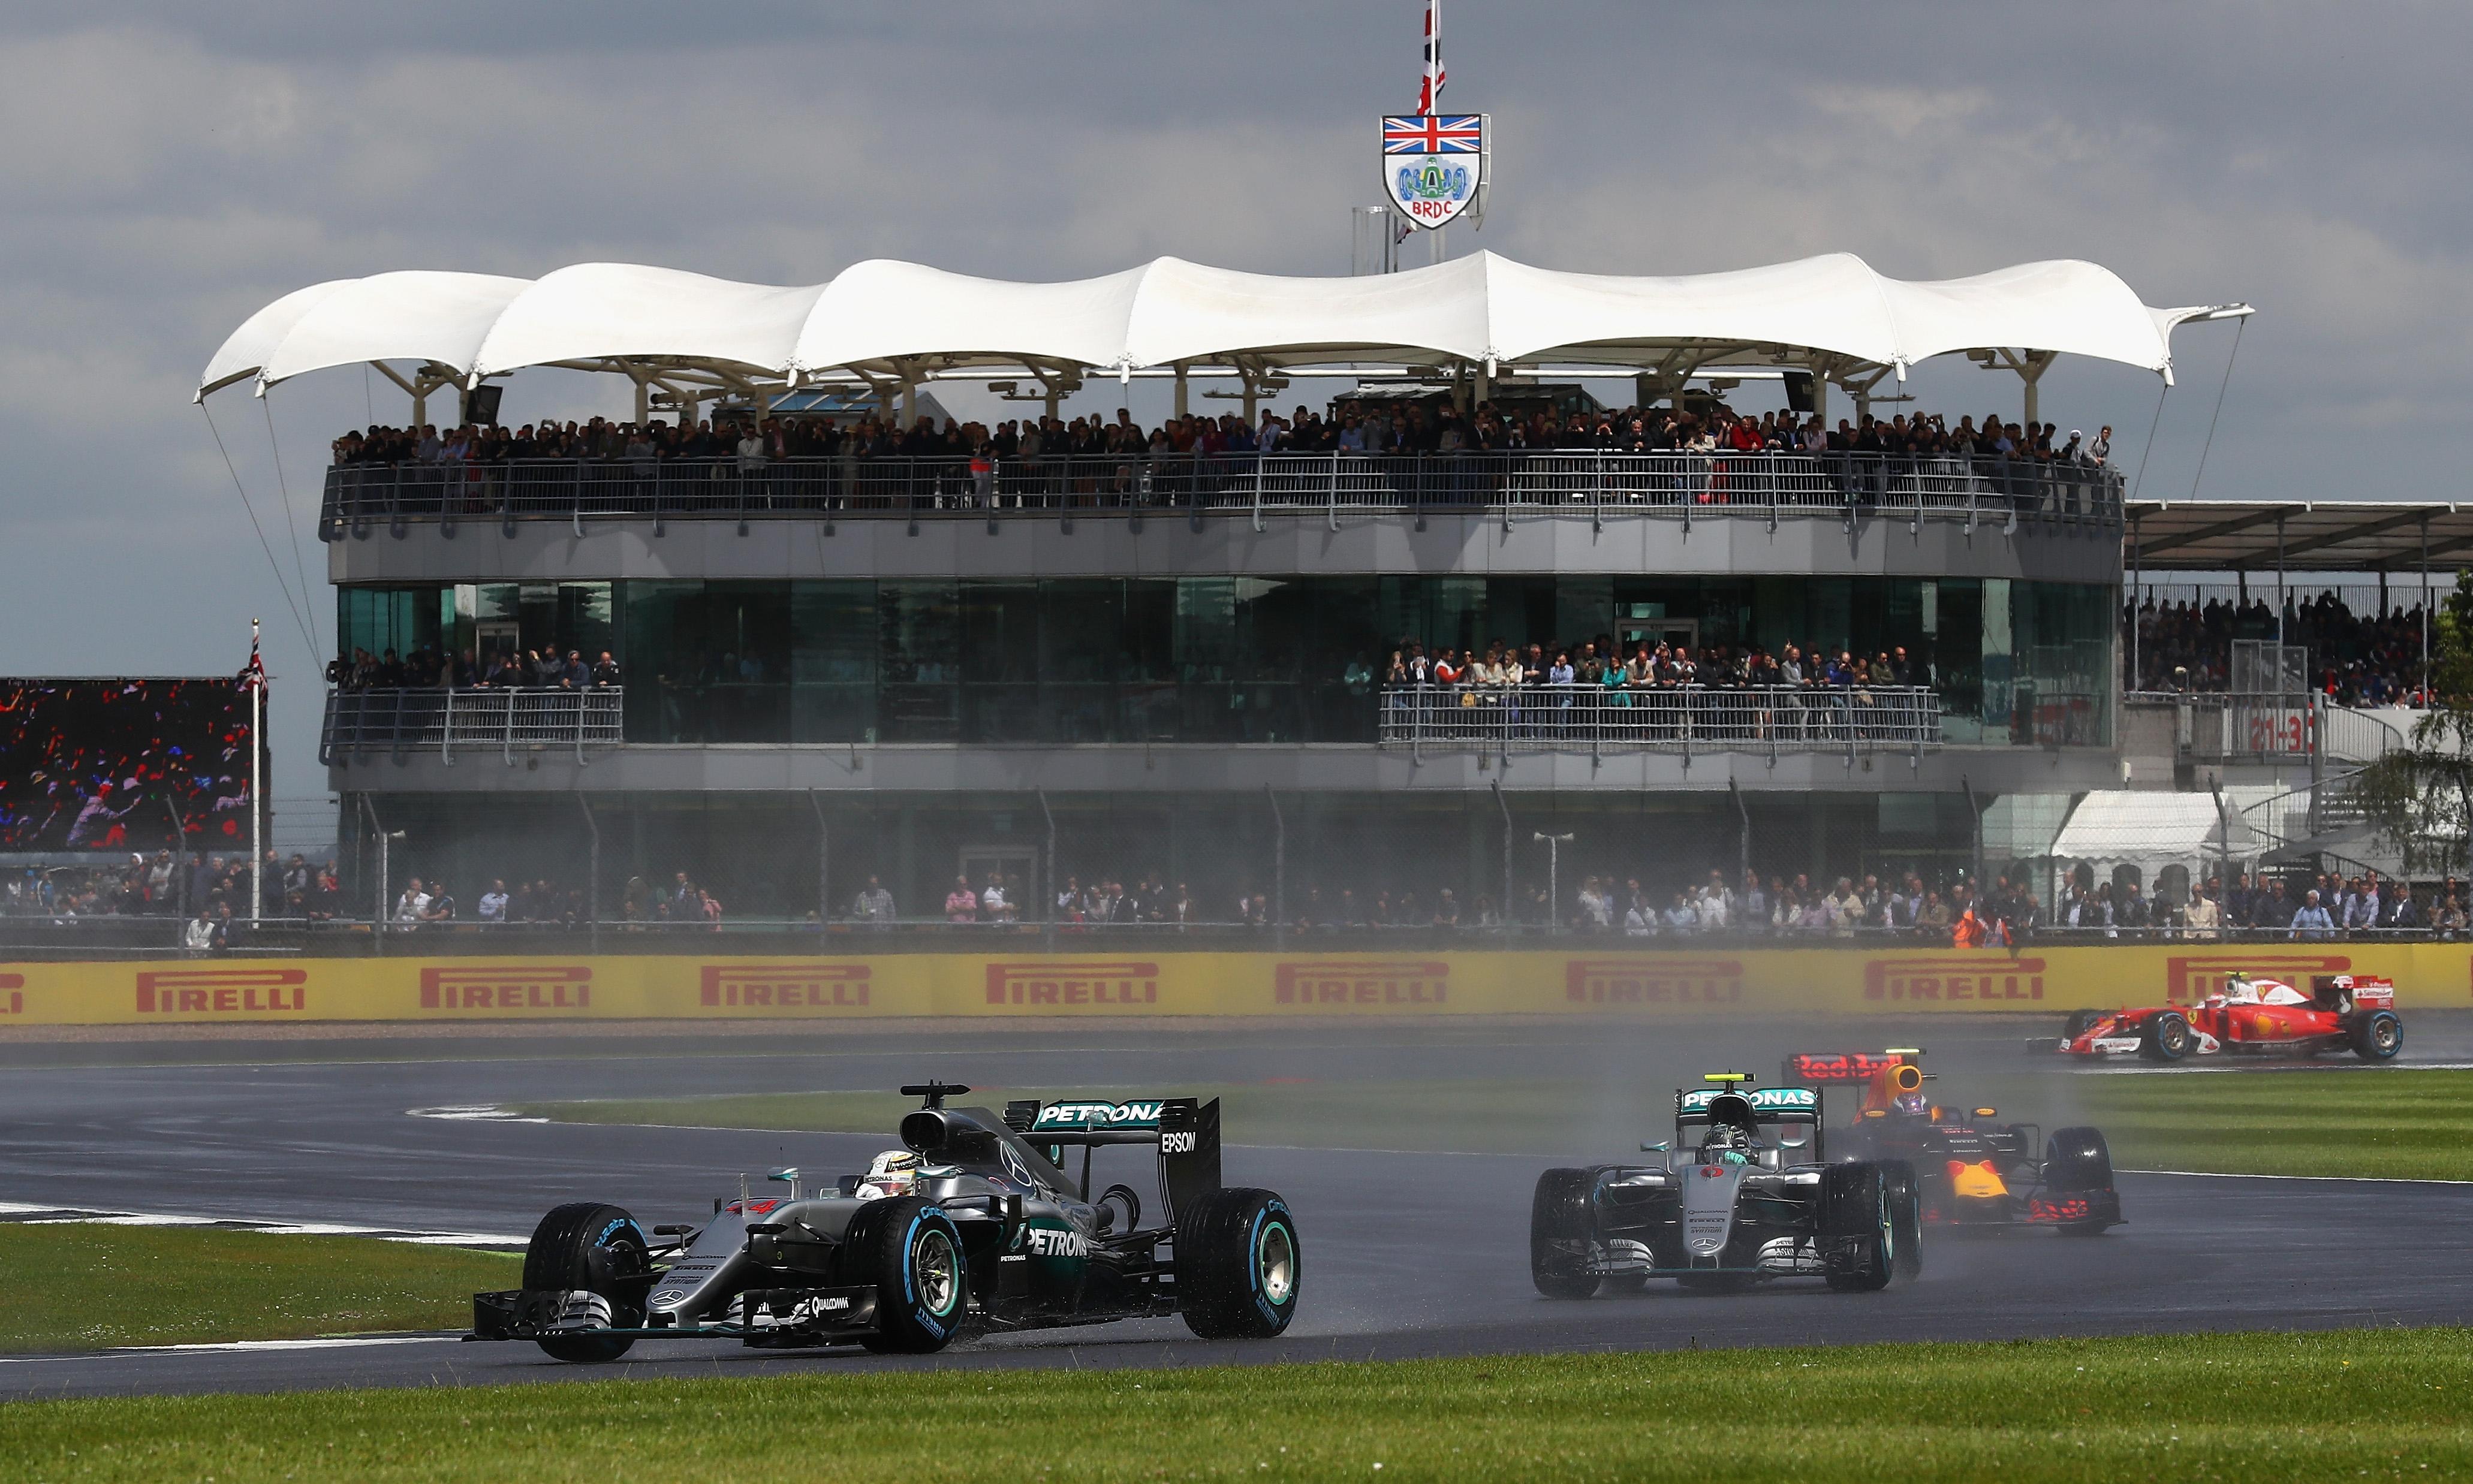 F1: Silverstone owners confident British Grand Prix will continue at circuit